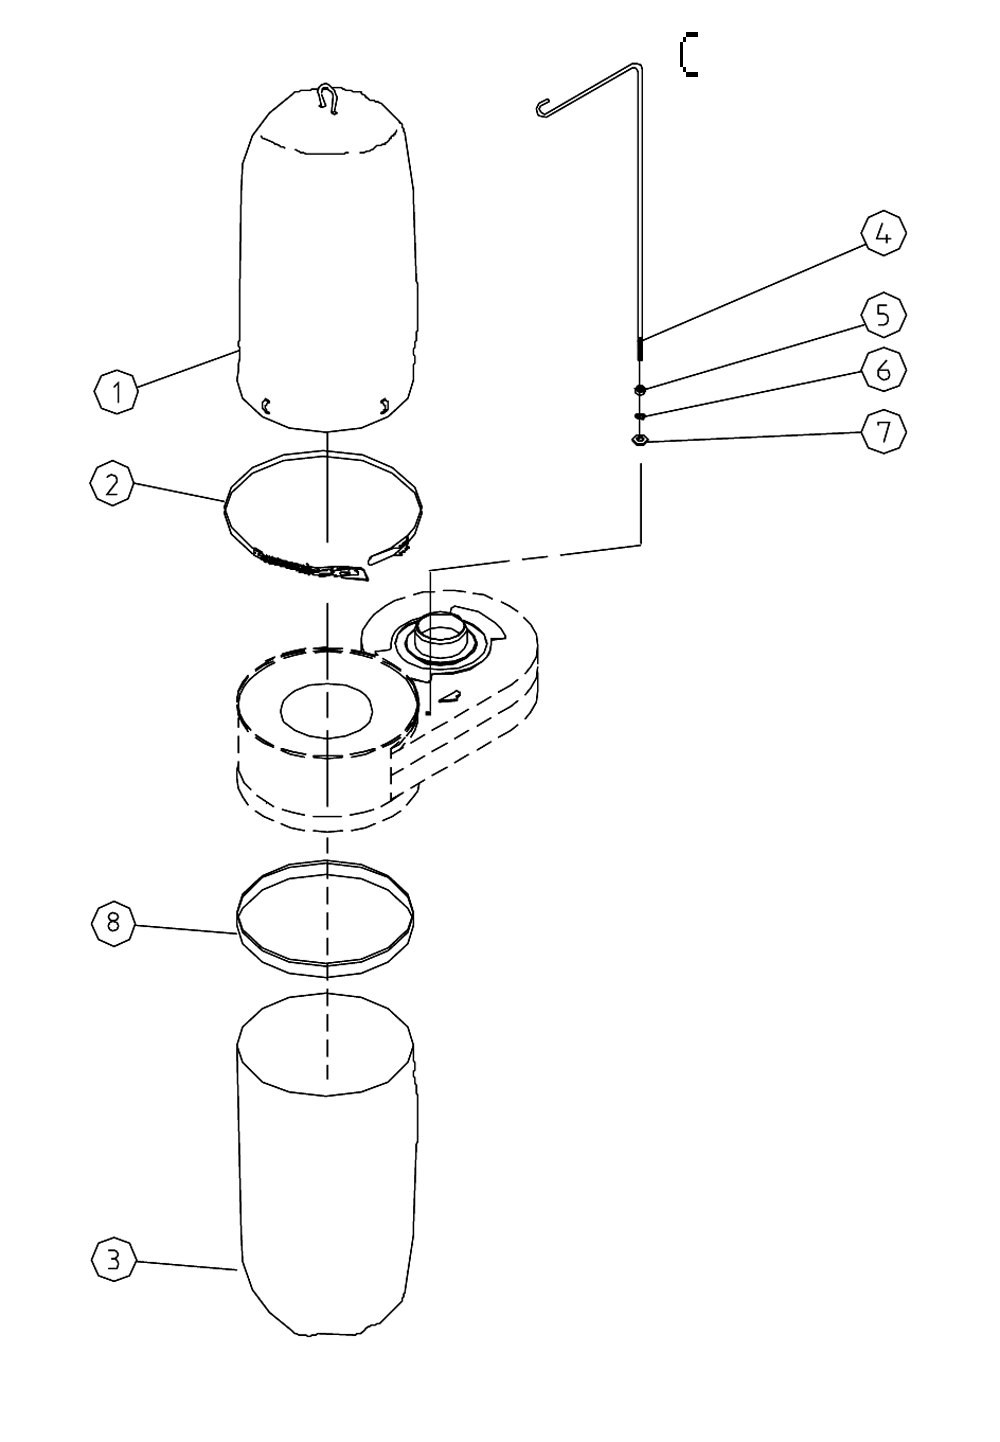 708642MK-jet-PB-3Break Down